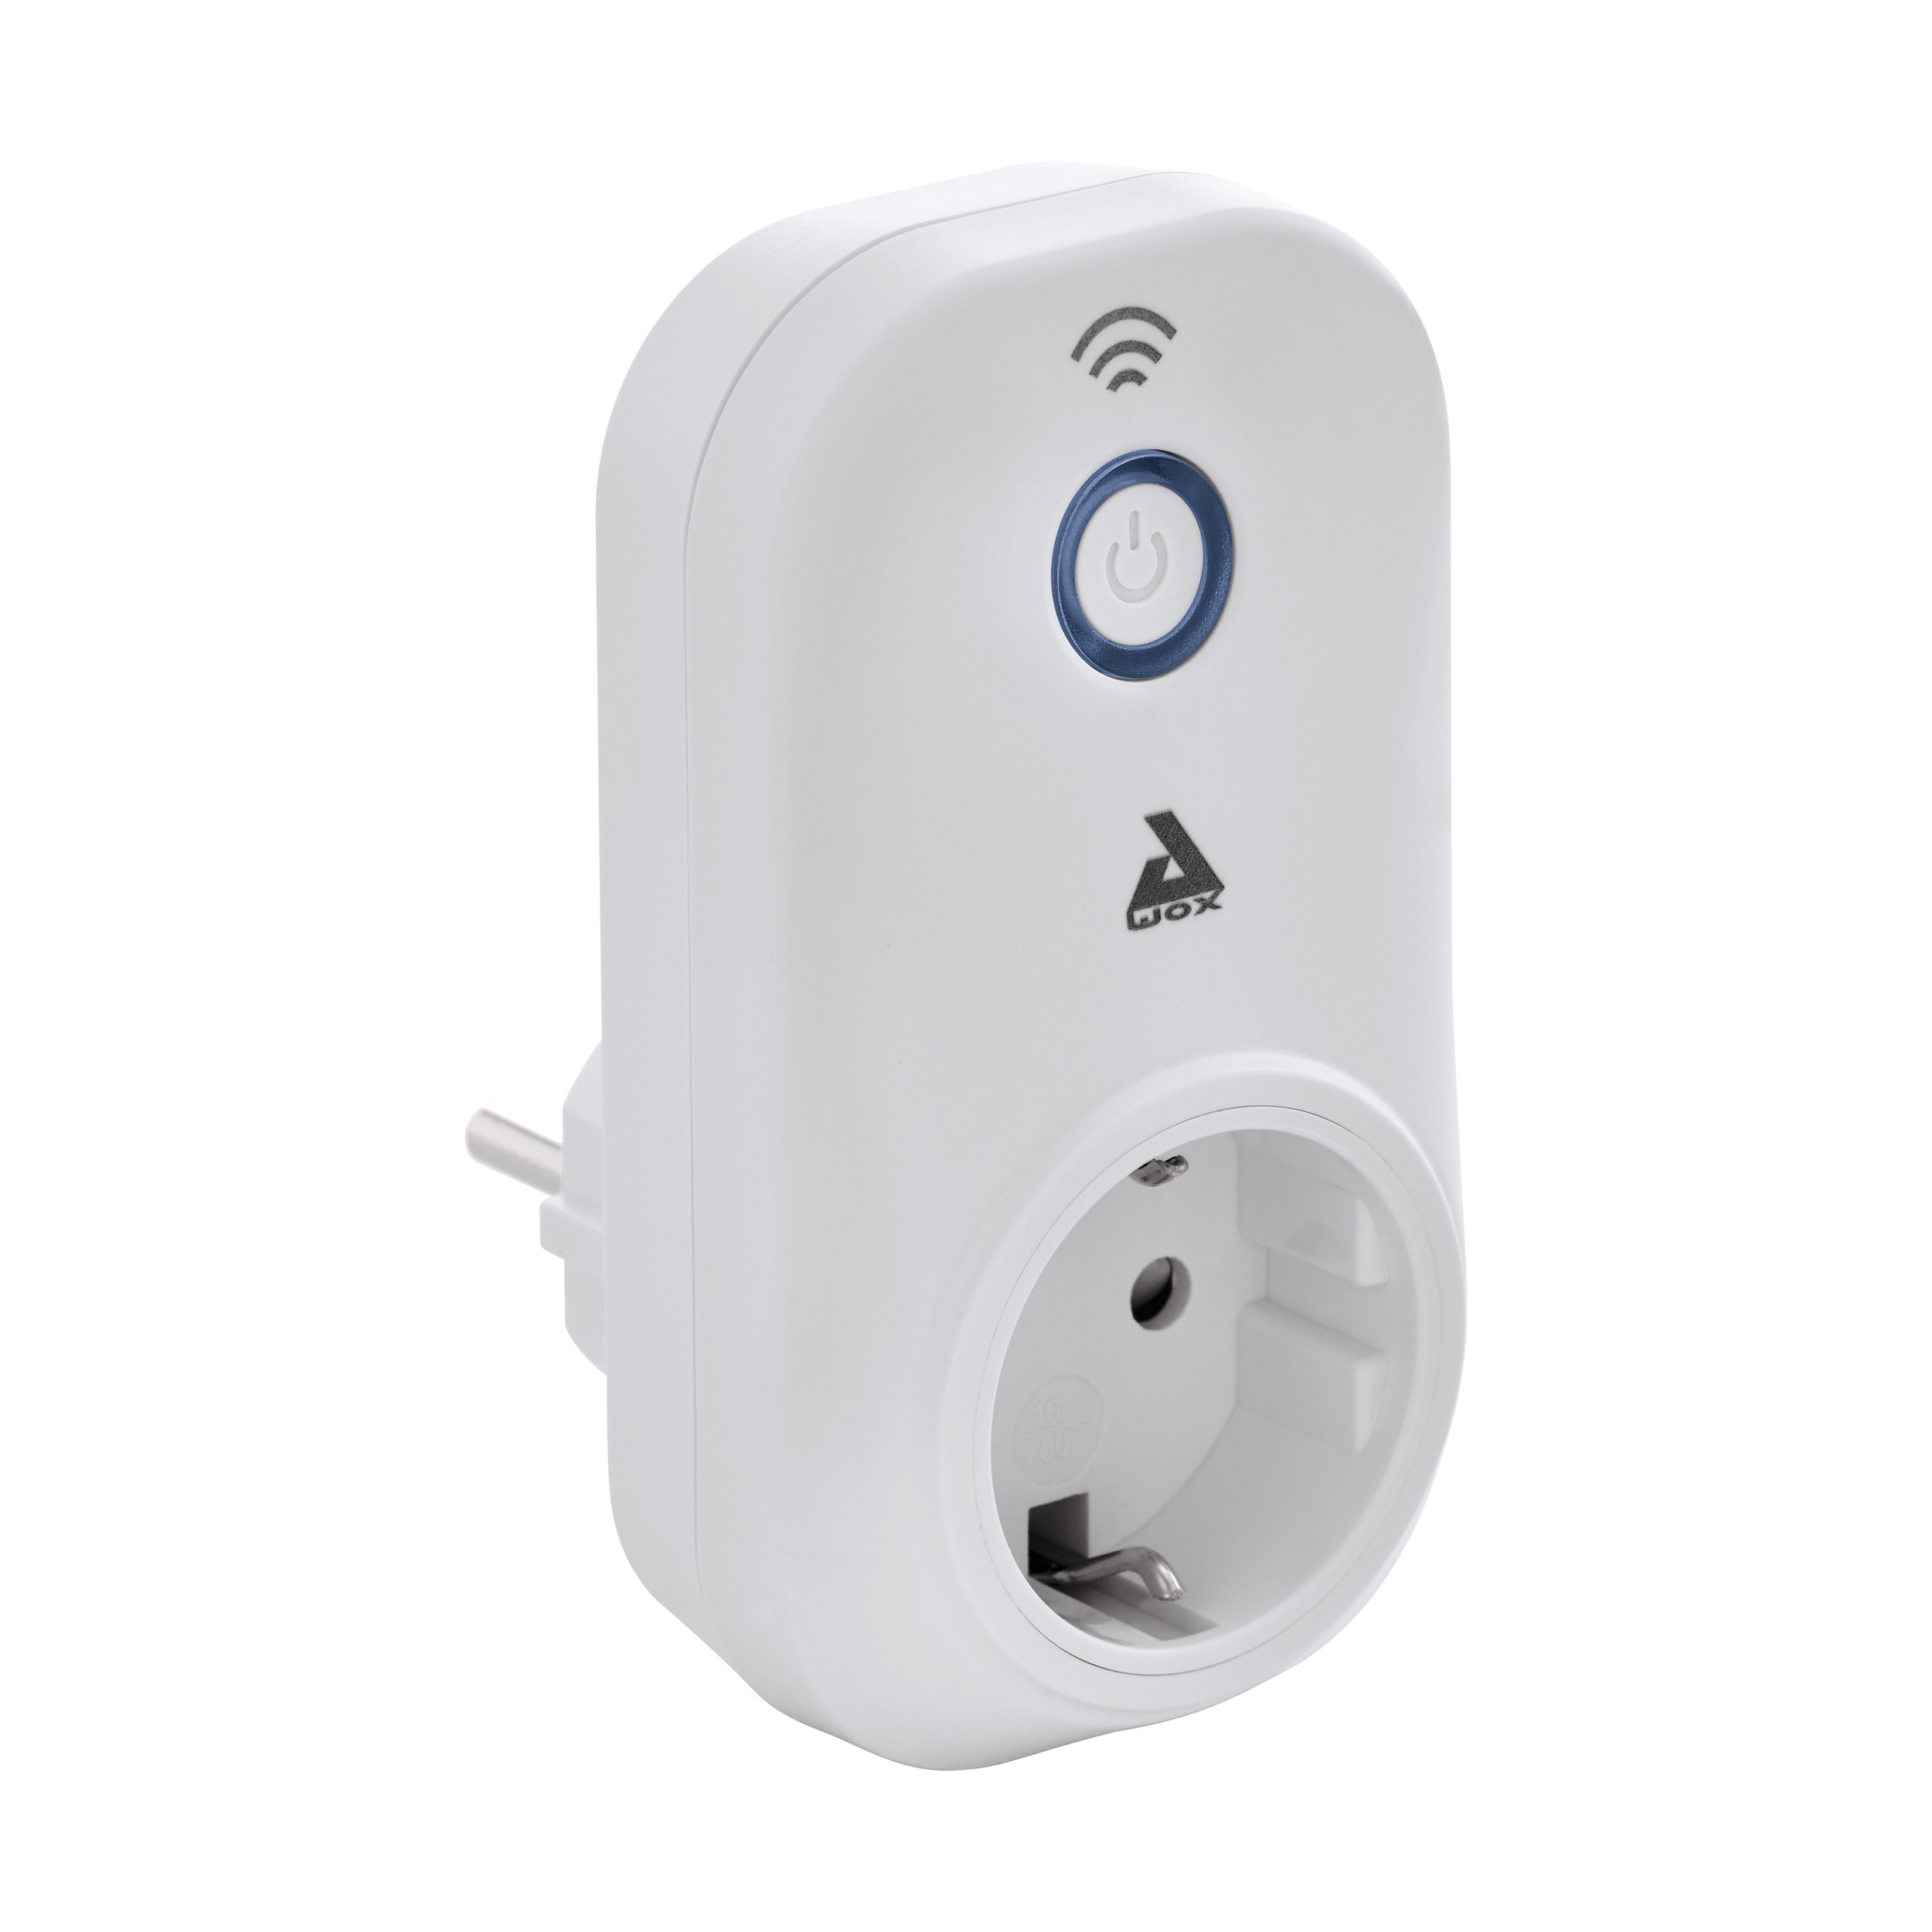 Eglo Connect Plug Plus Tomada Inteligente